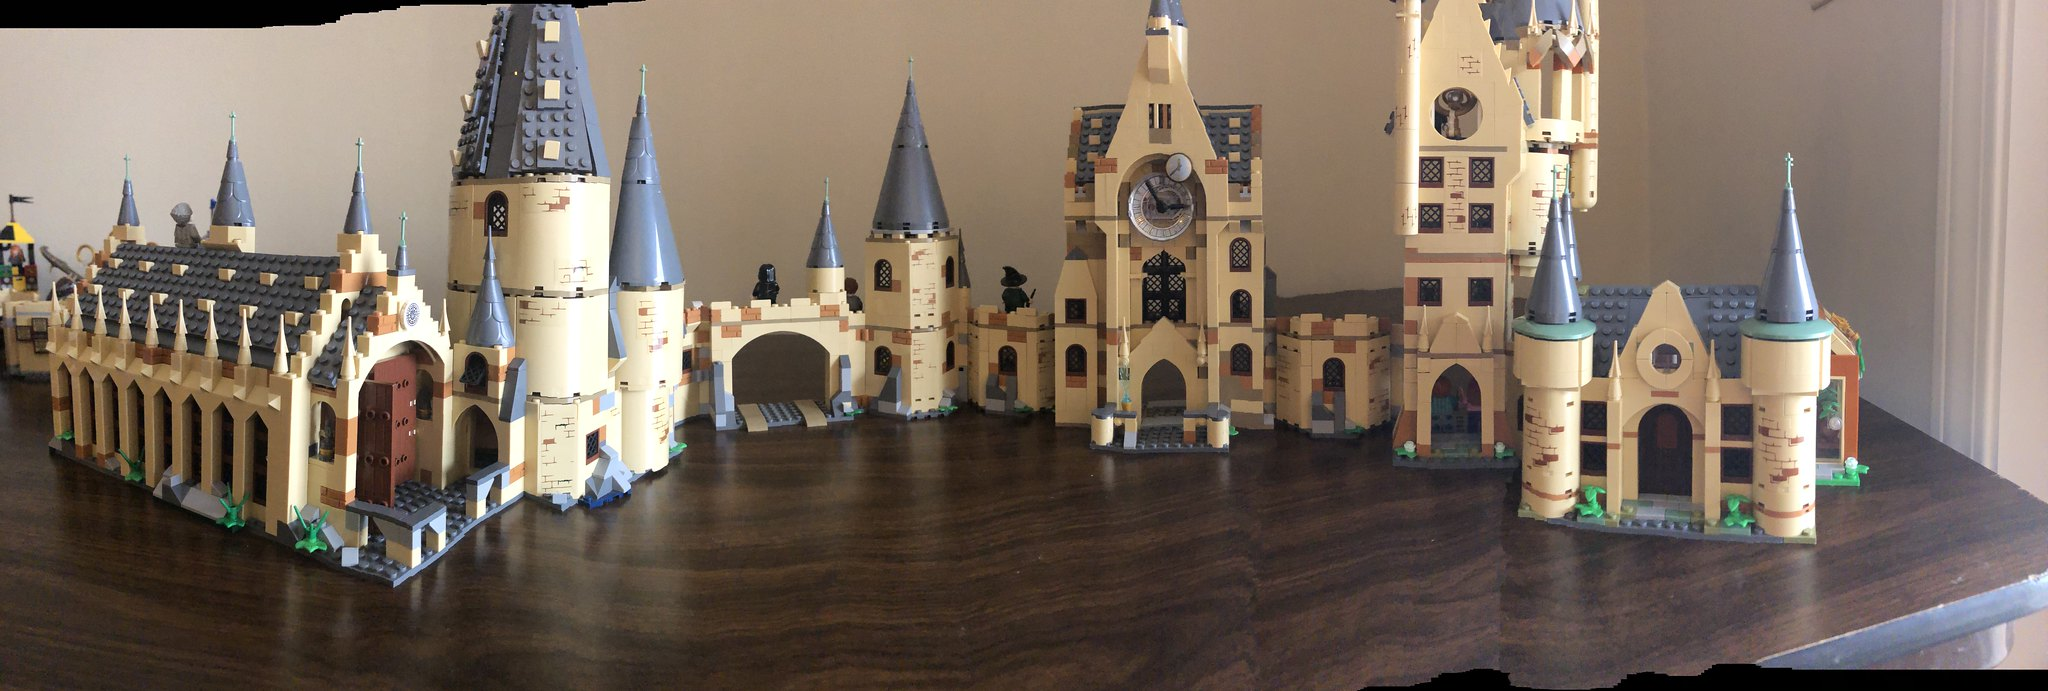 Hogwarts panorama